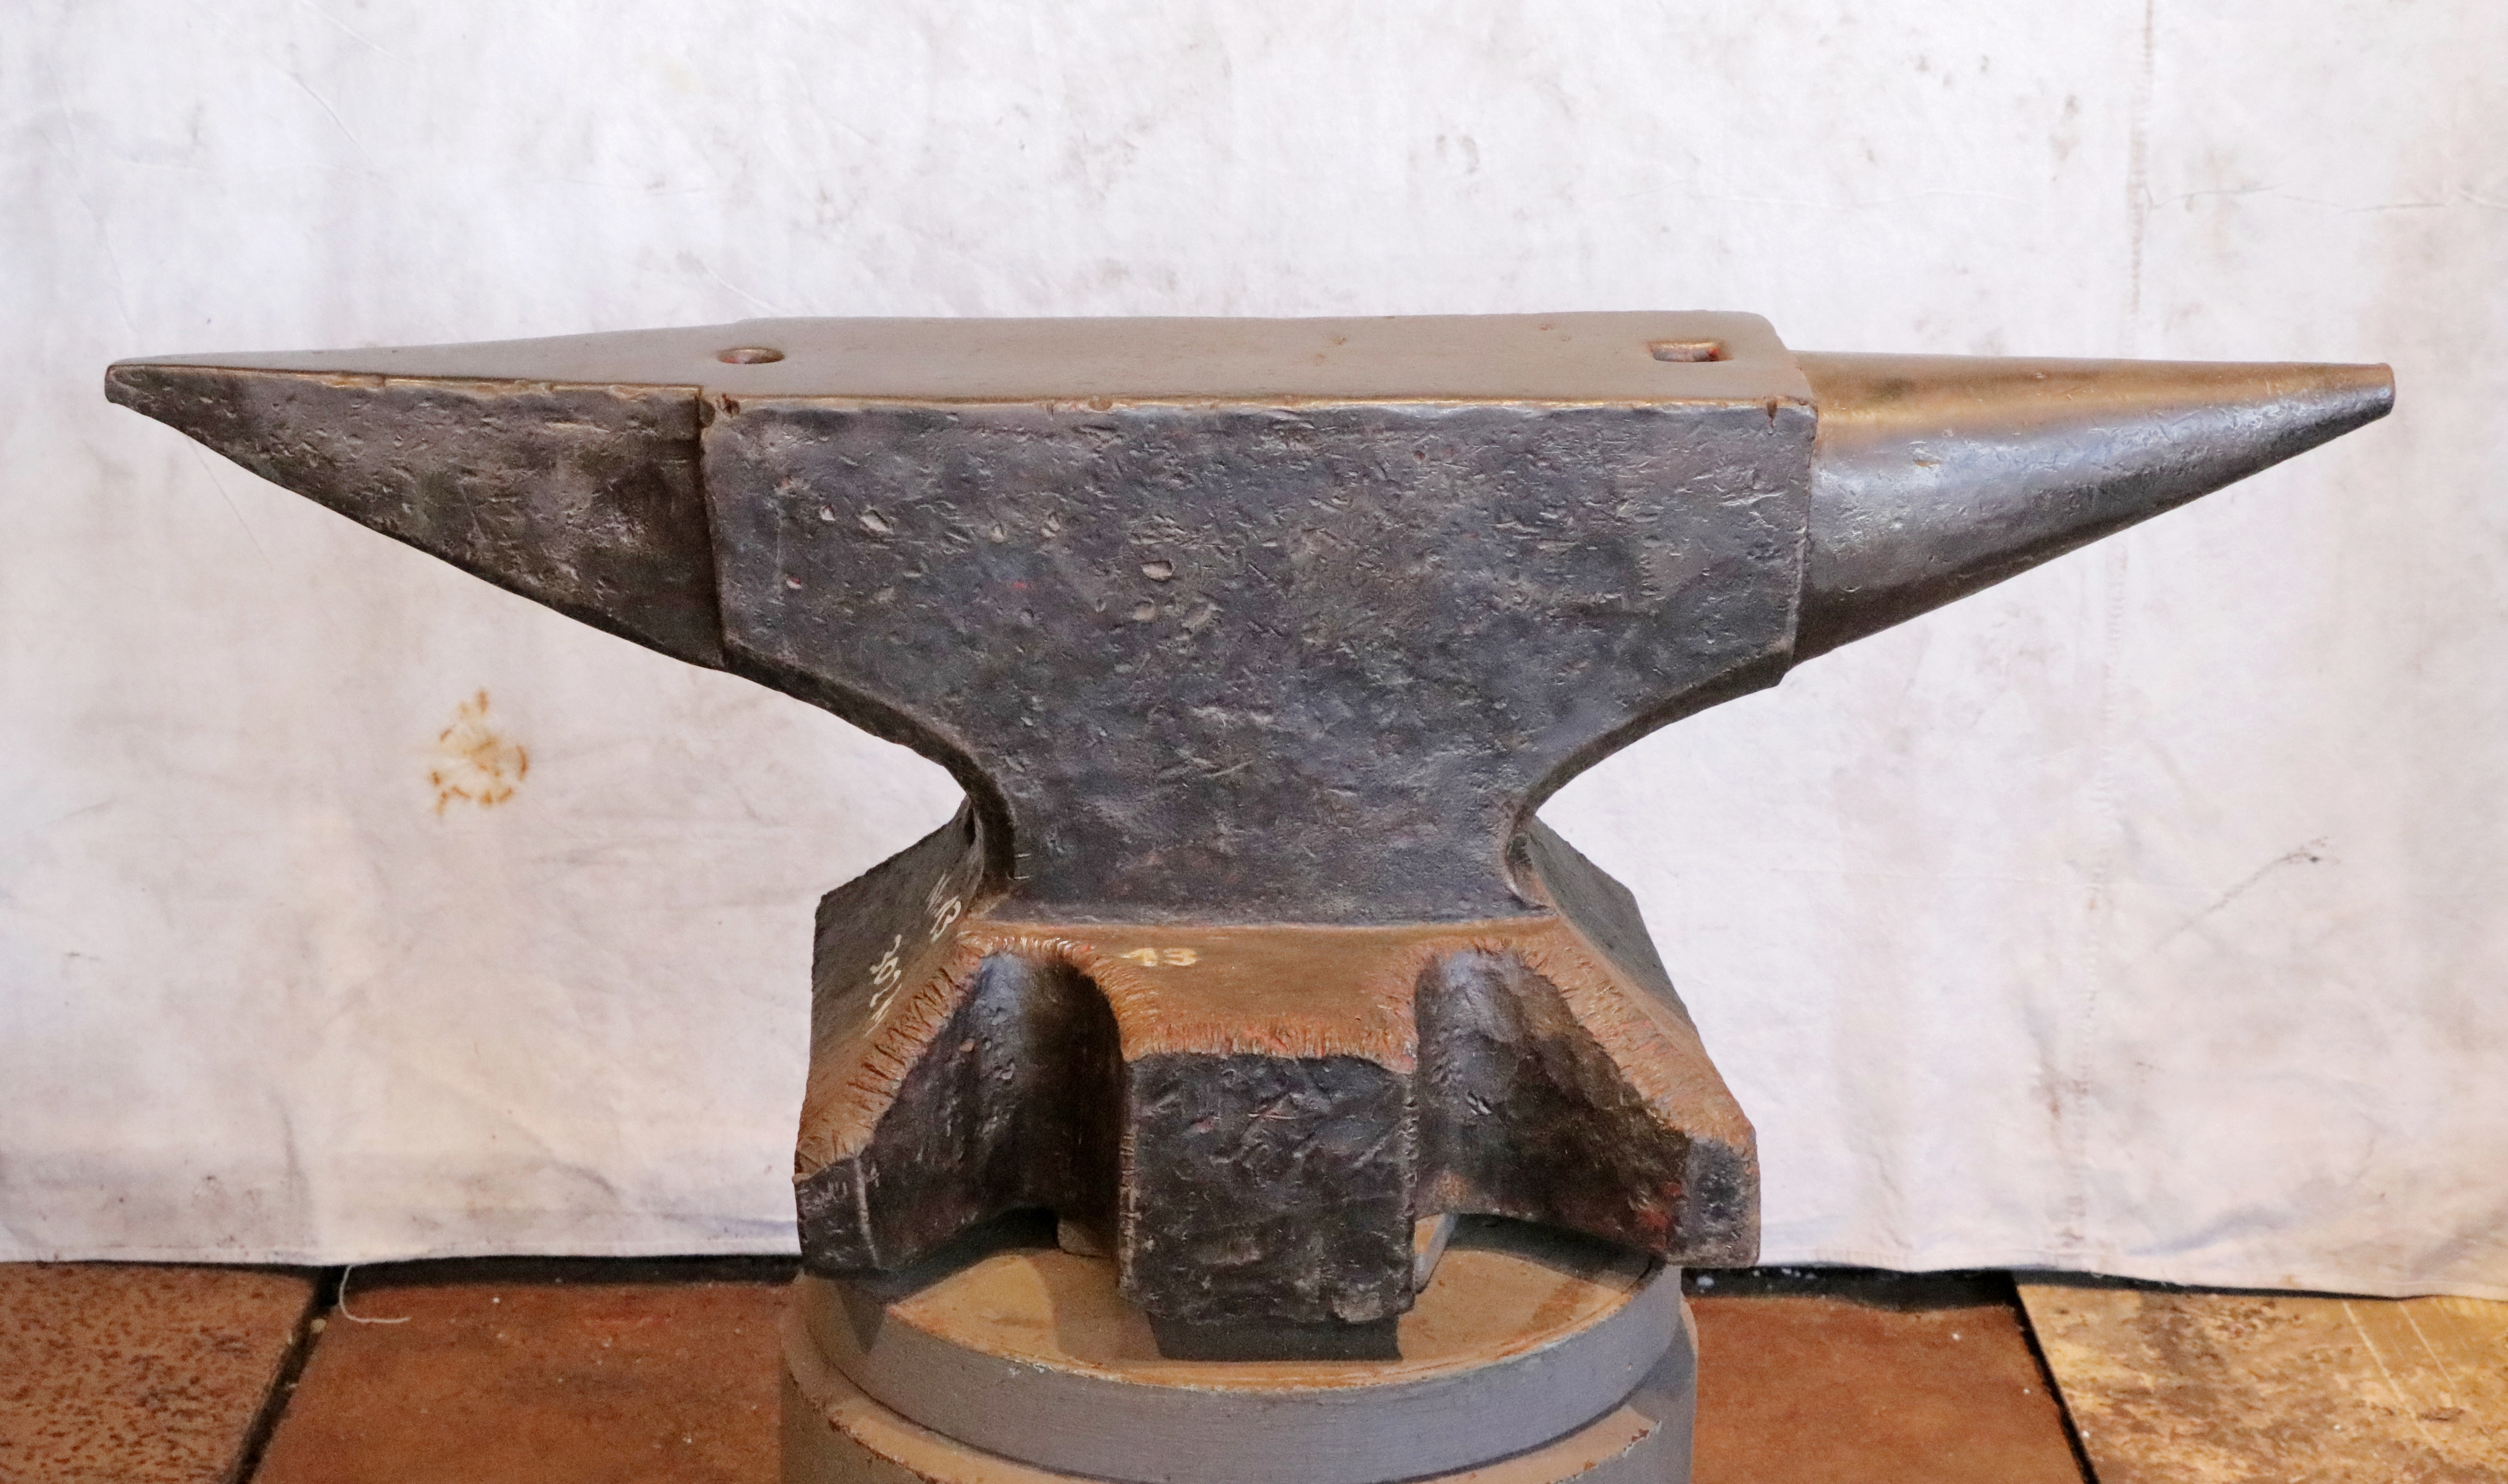 664 lb German anvil for sale - North German double horn blacksmith anvil